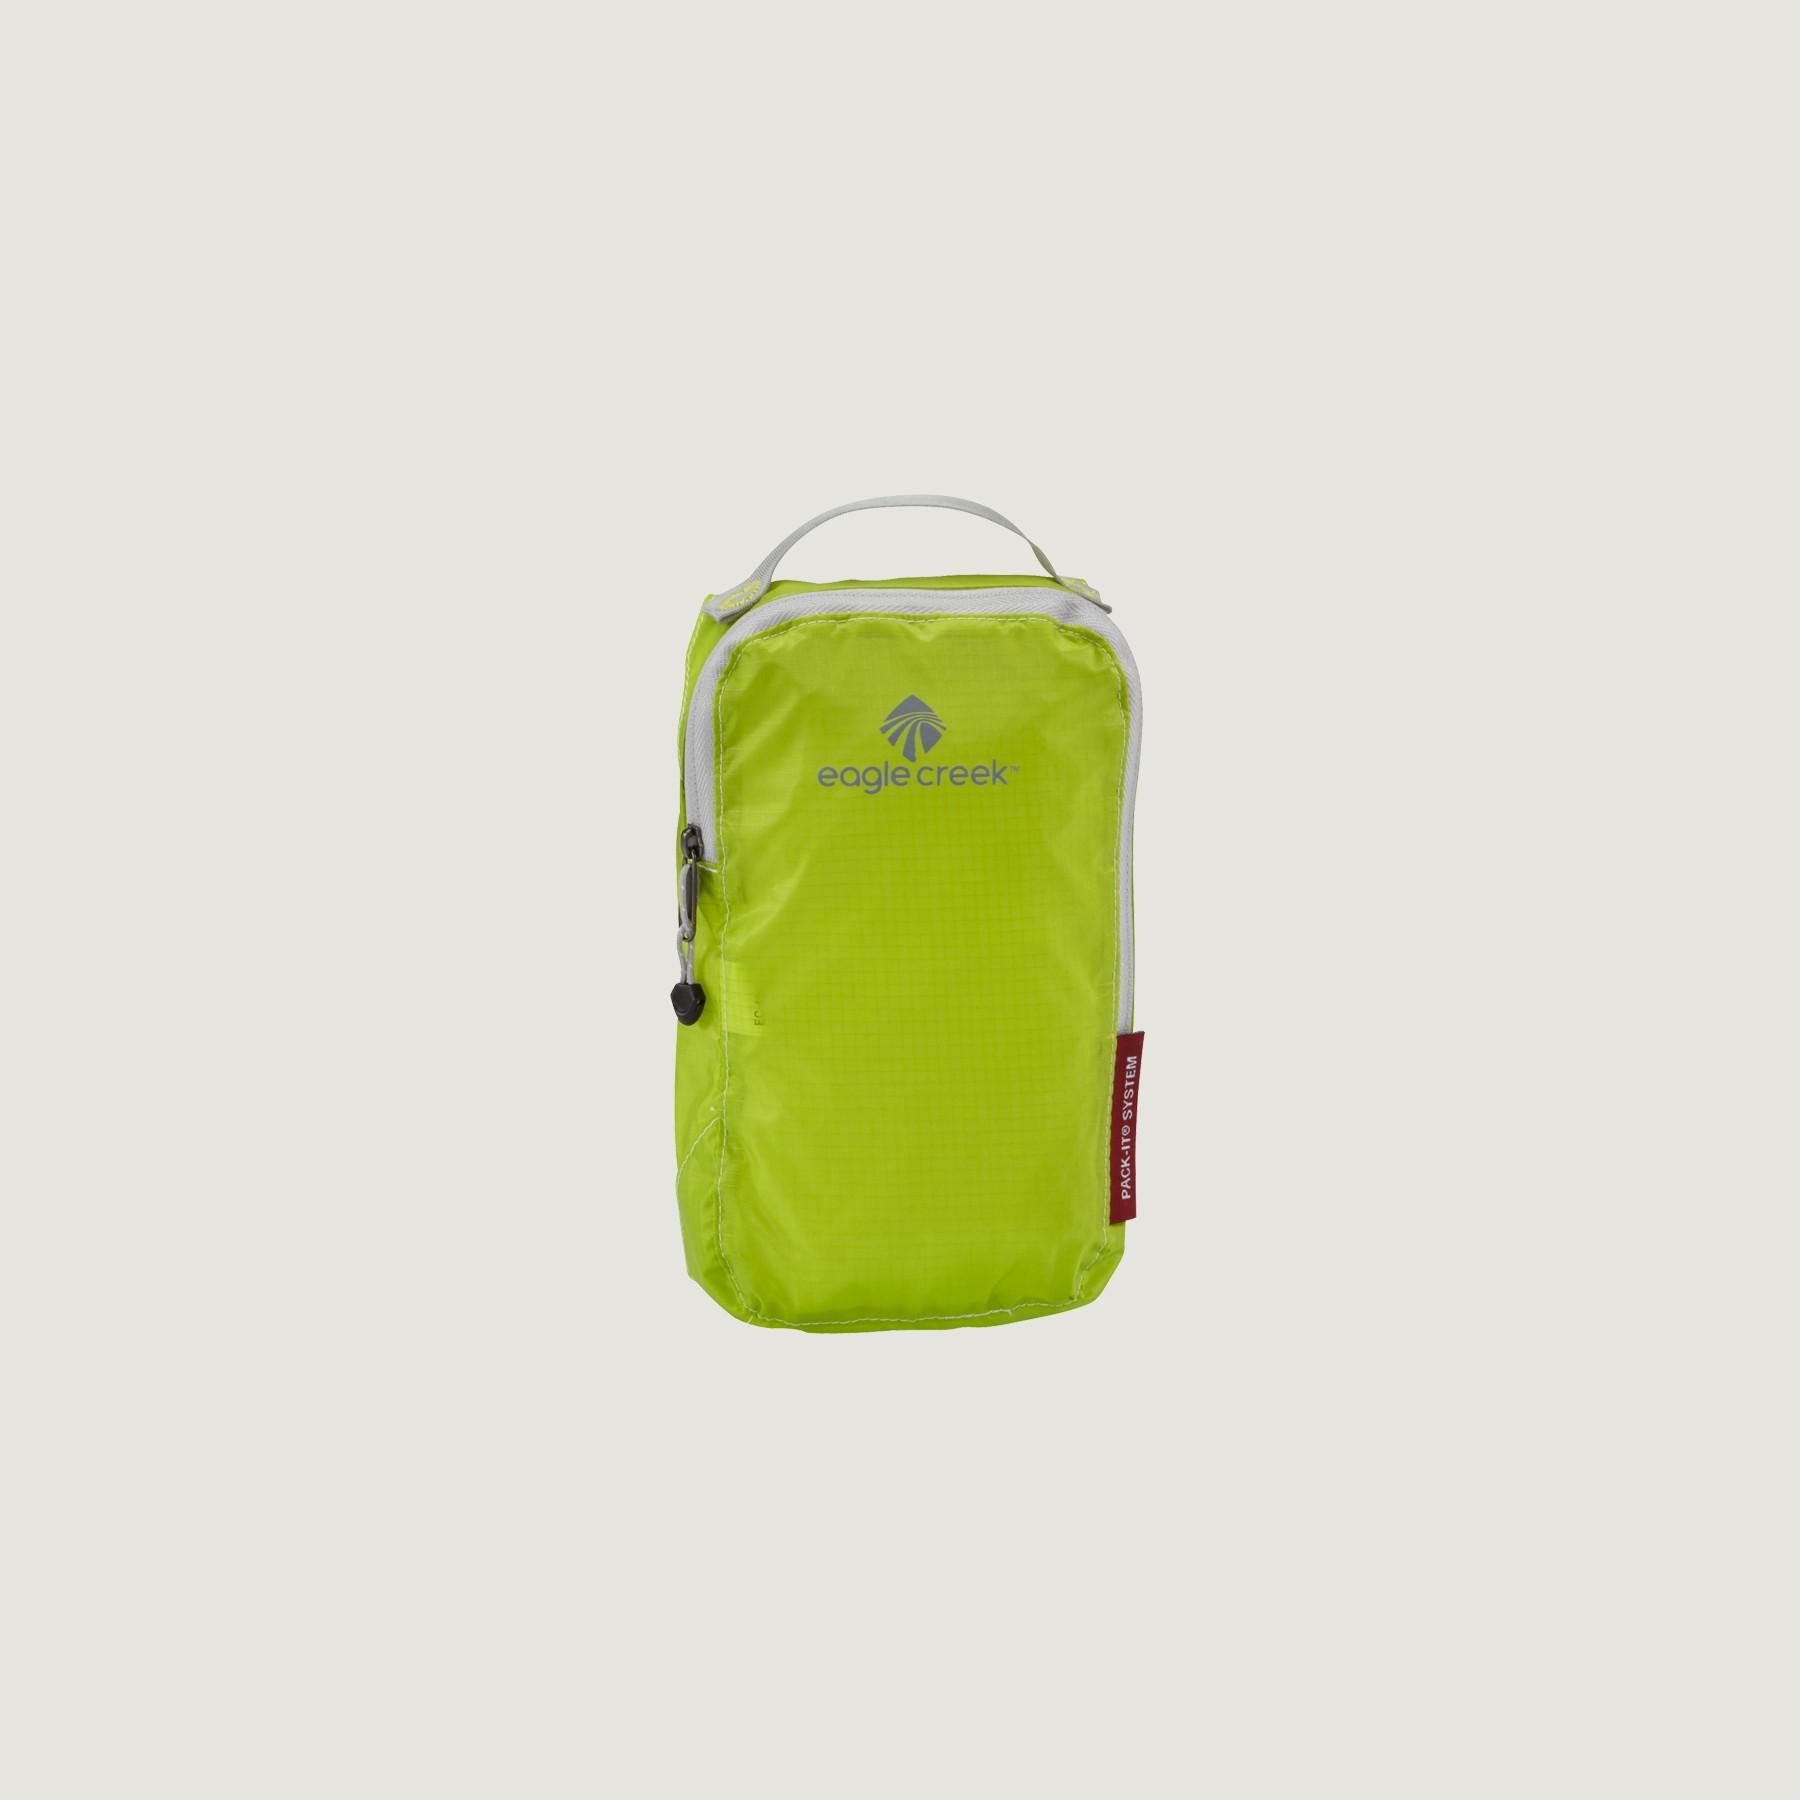 Pack-It Specter™ Cube XS